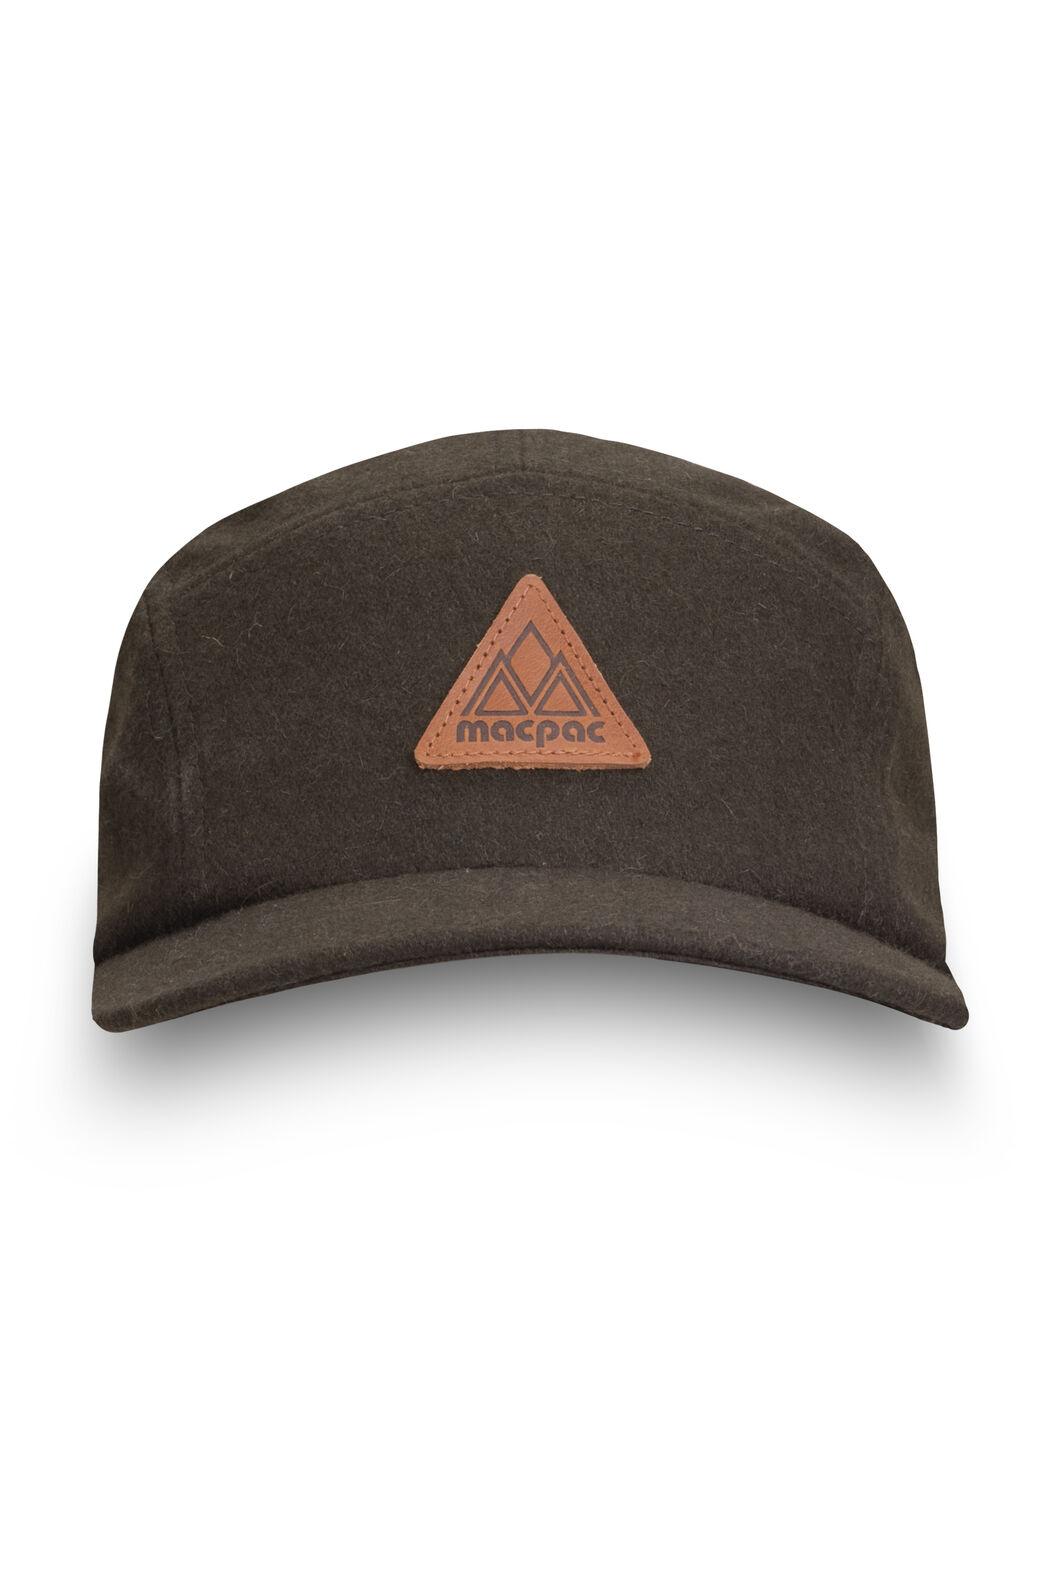 Macpac Wool Blend 5-Panel Hat, Green, hi-res